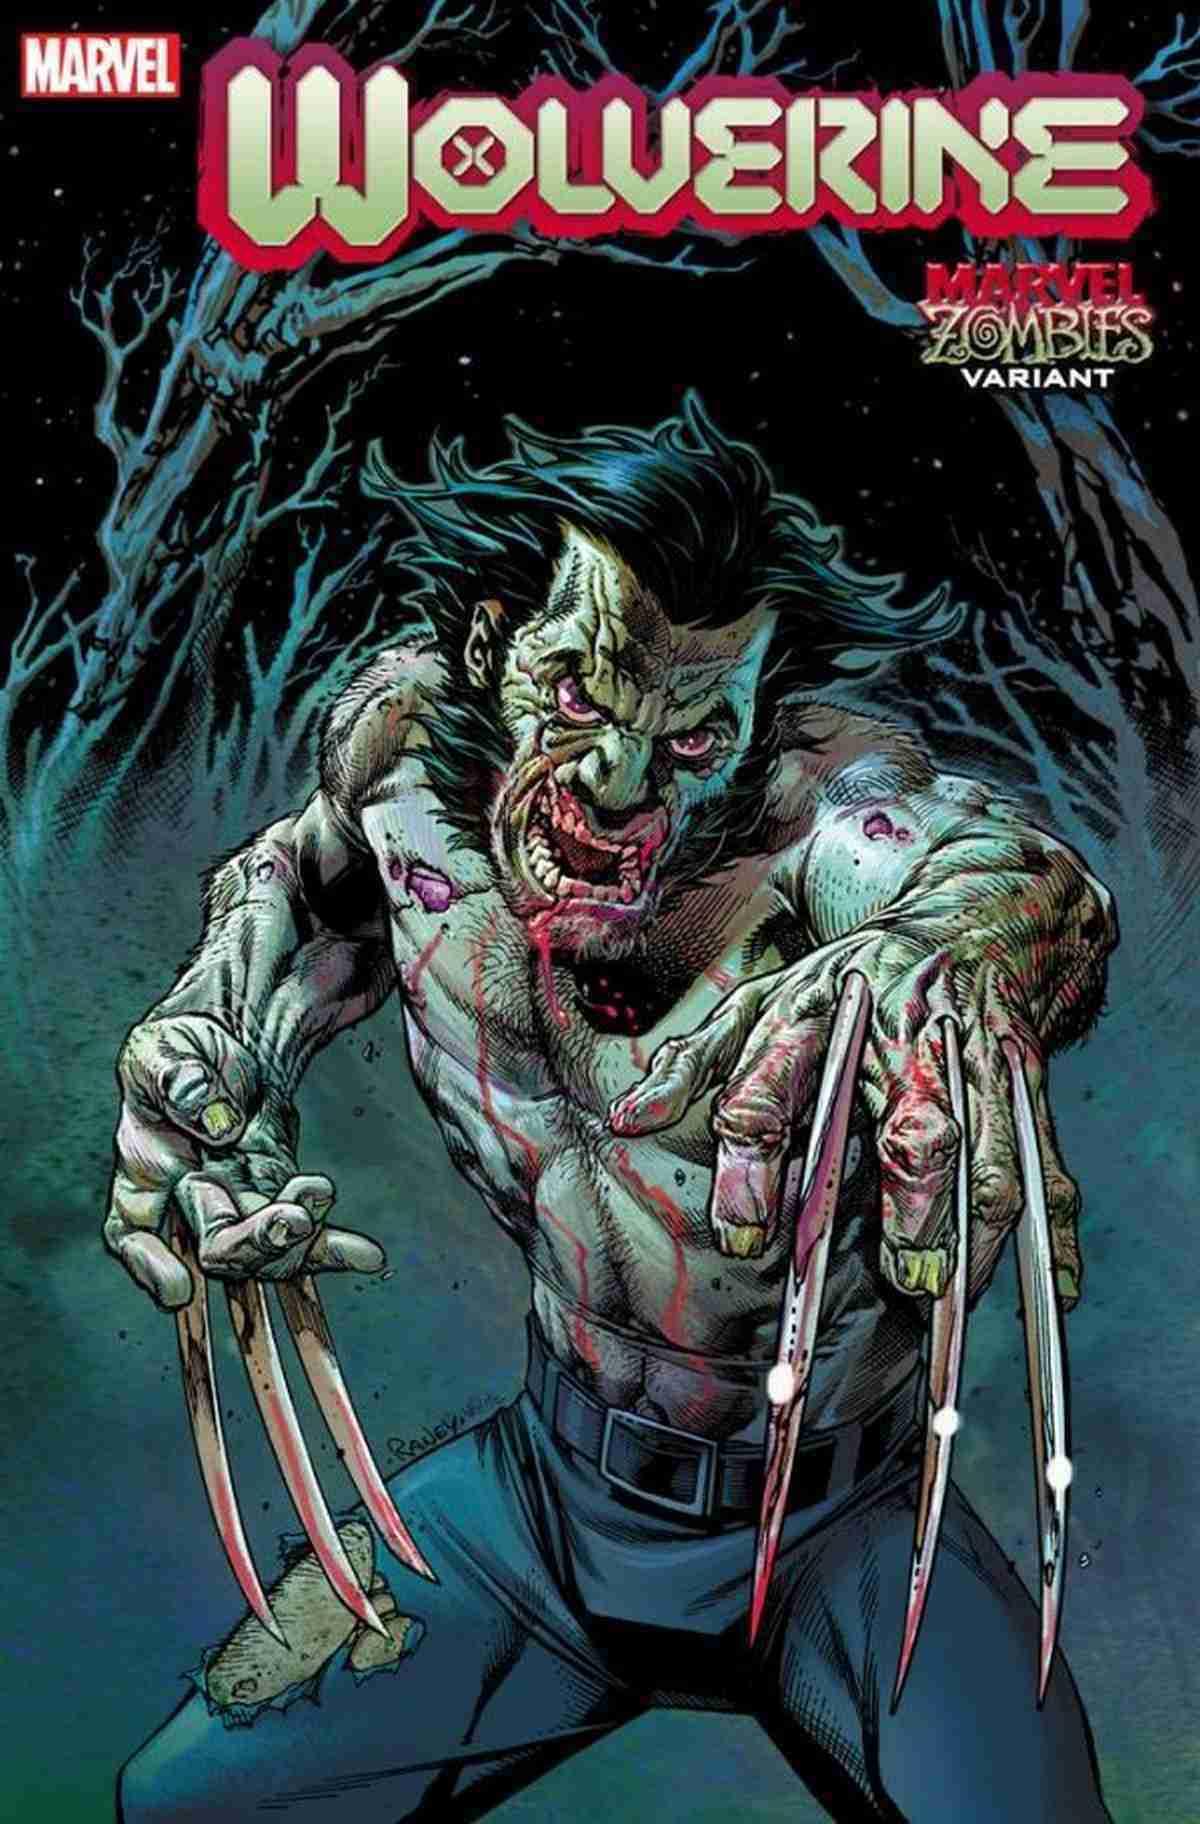 Wolverine 3 Marvel Zombies Variant